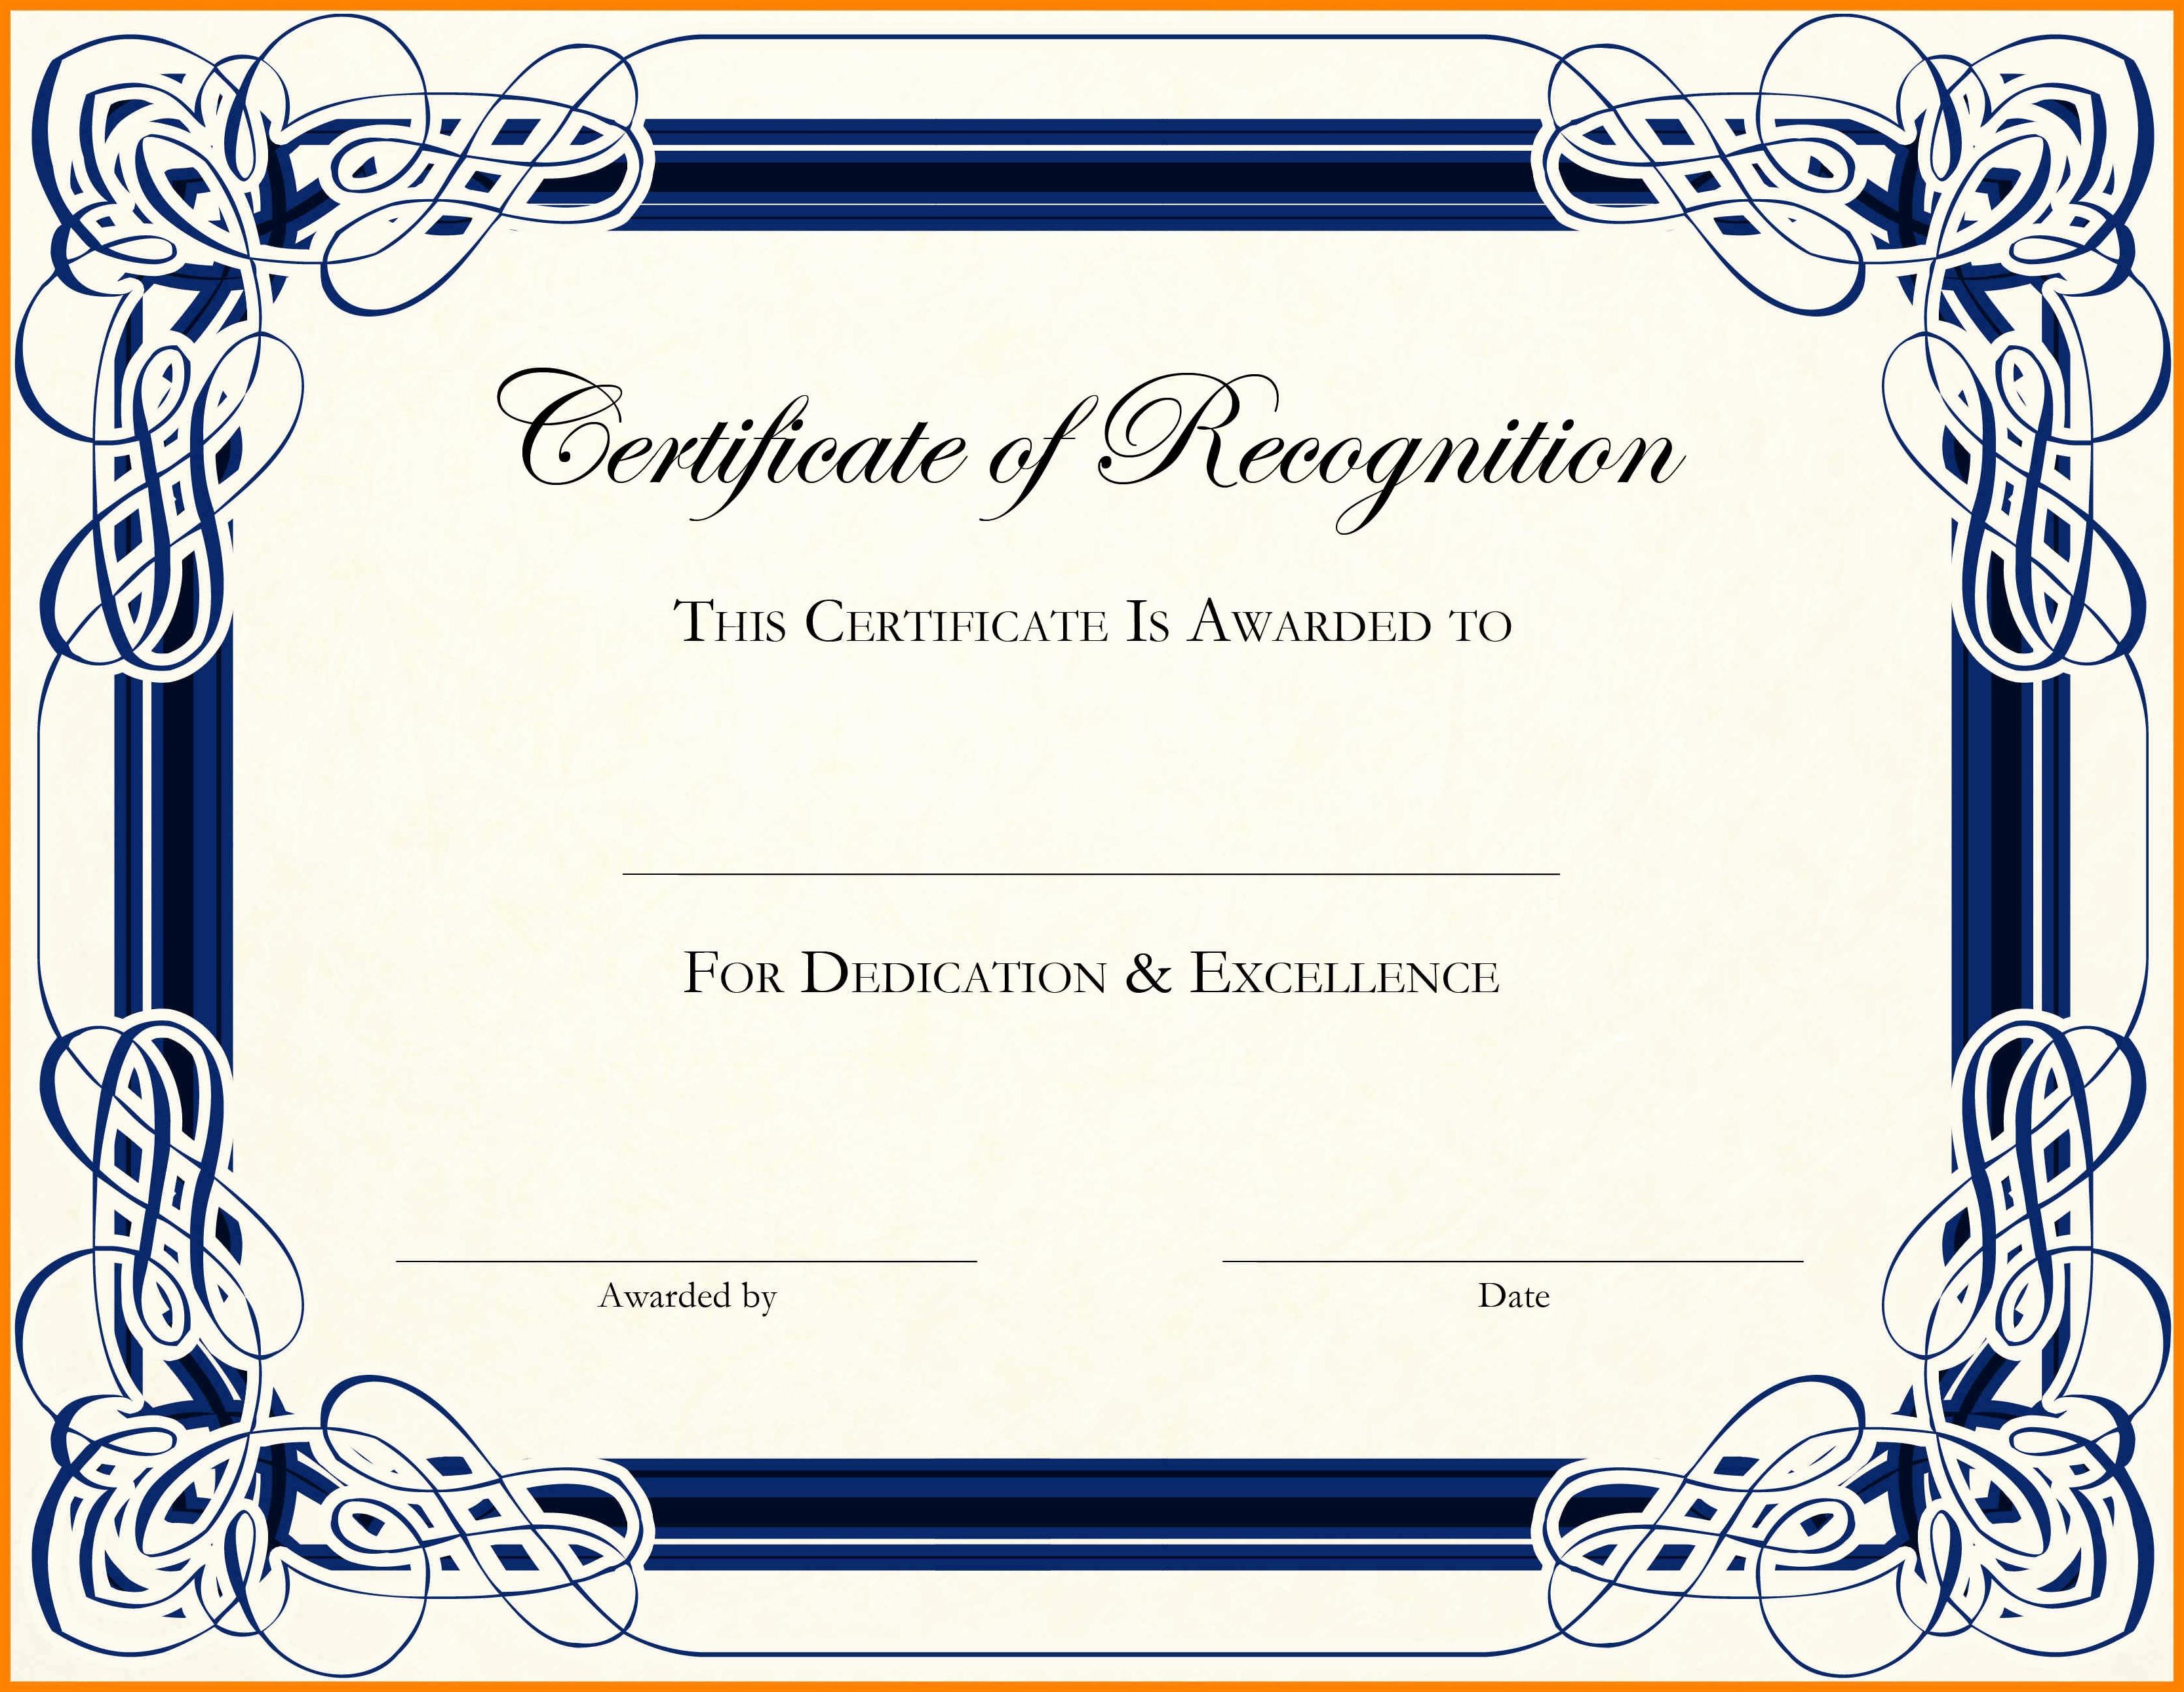 Certificate Design Templates Free Download Beautiful 15 Certificate Templates Word Free